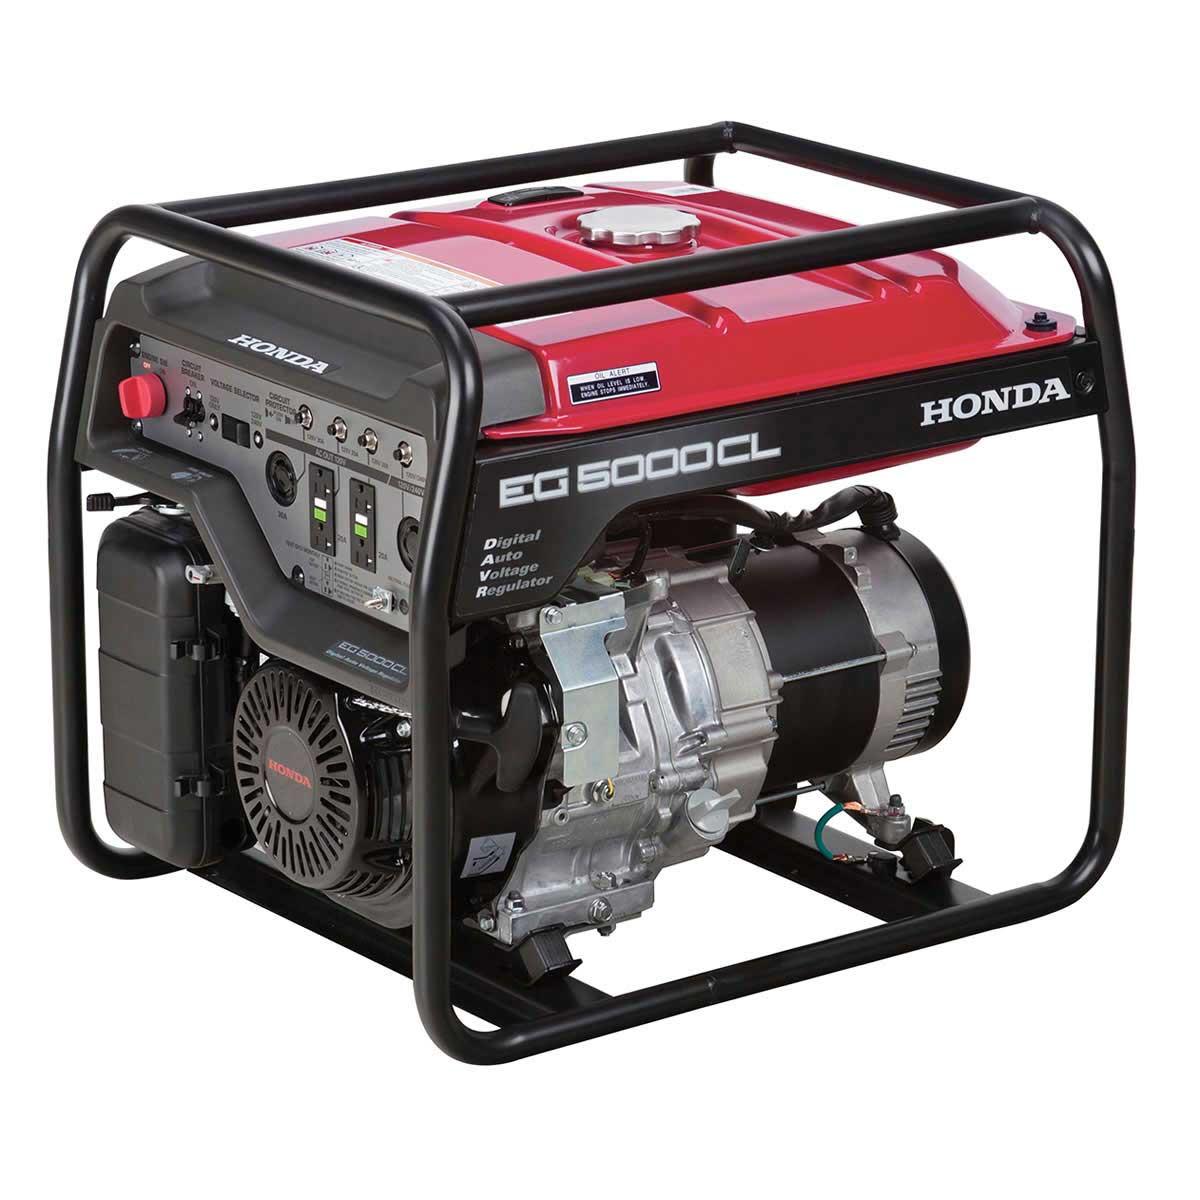 Honda Generator EG5000